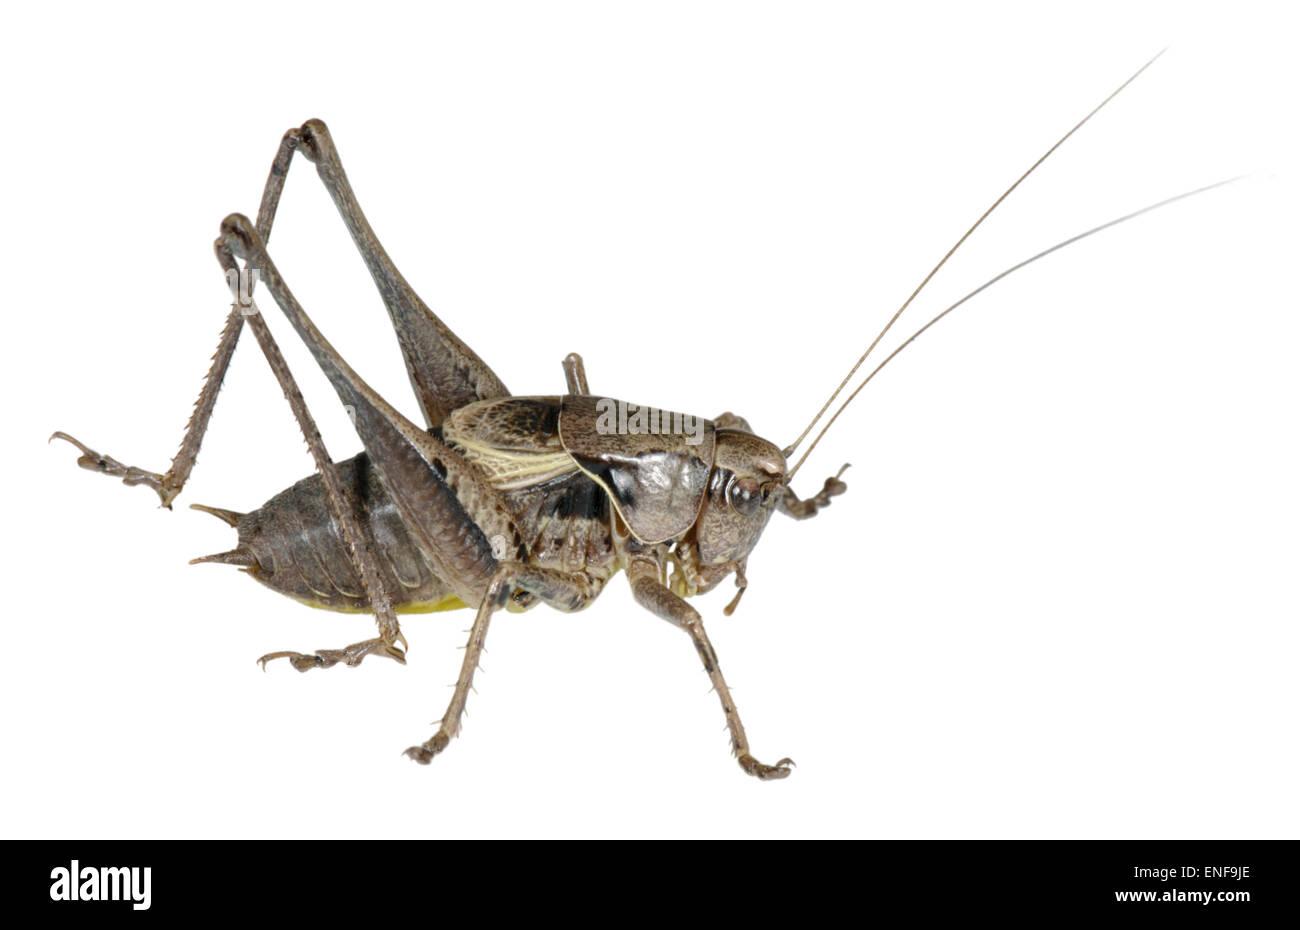 Bush oscuro-cricket macho - Pholidoptera griseoaptera Imagen De Stock